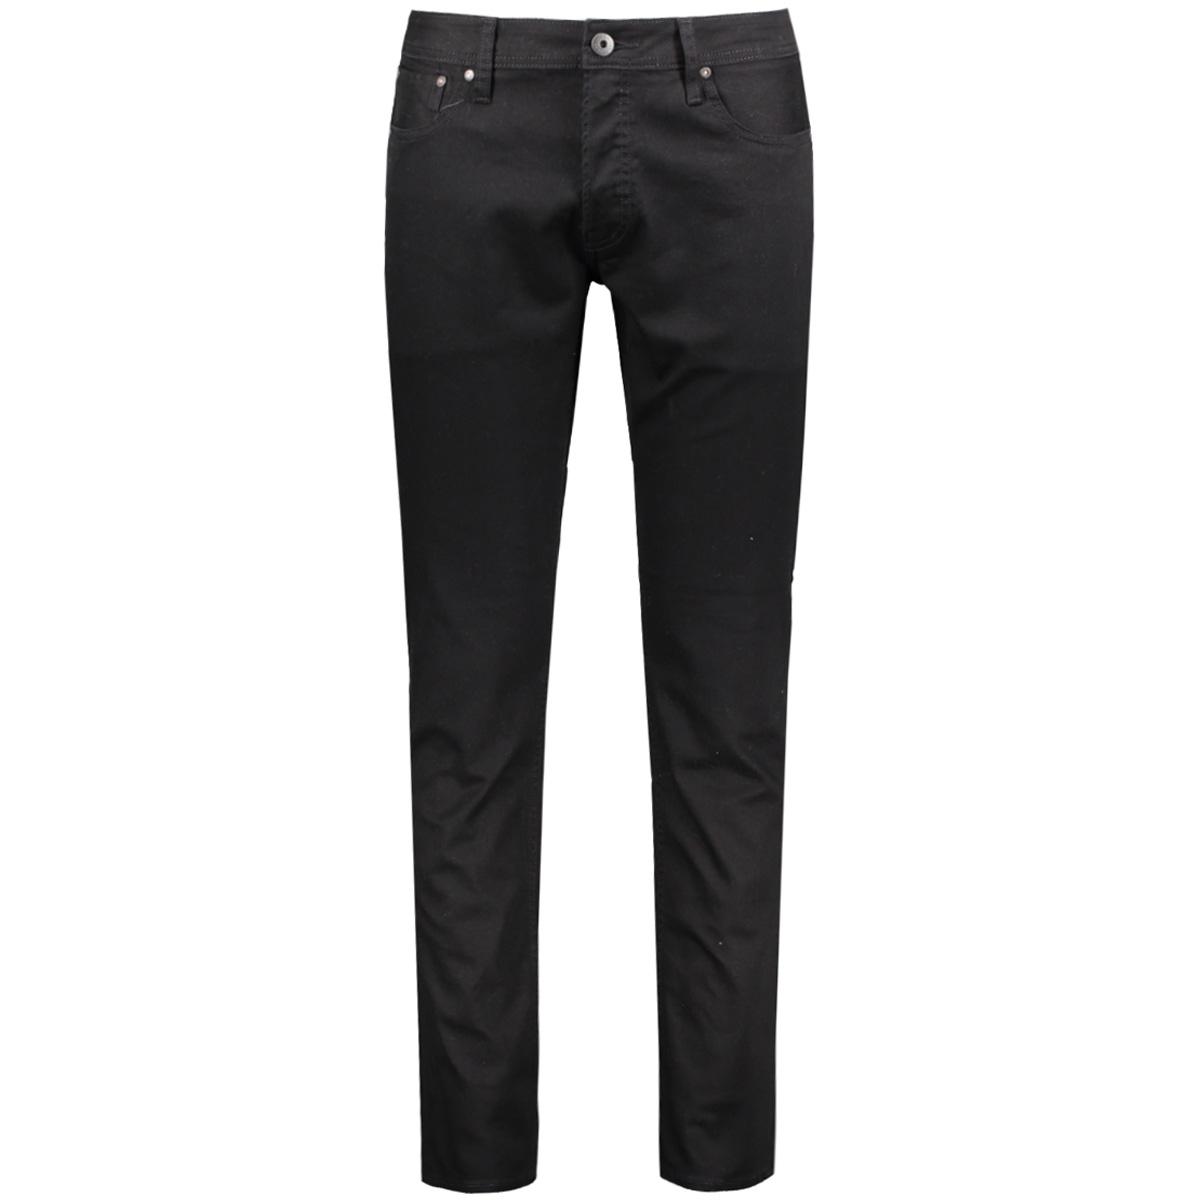 jjitim jjoriginal cr 009 lid noos 12127247 jack & jones jeans black denim